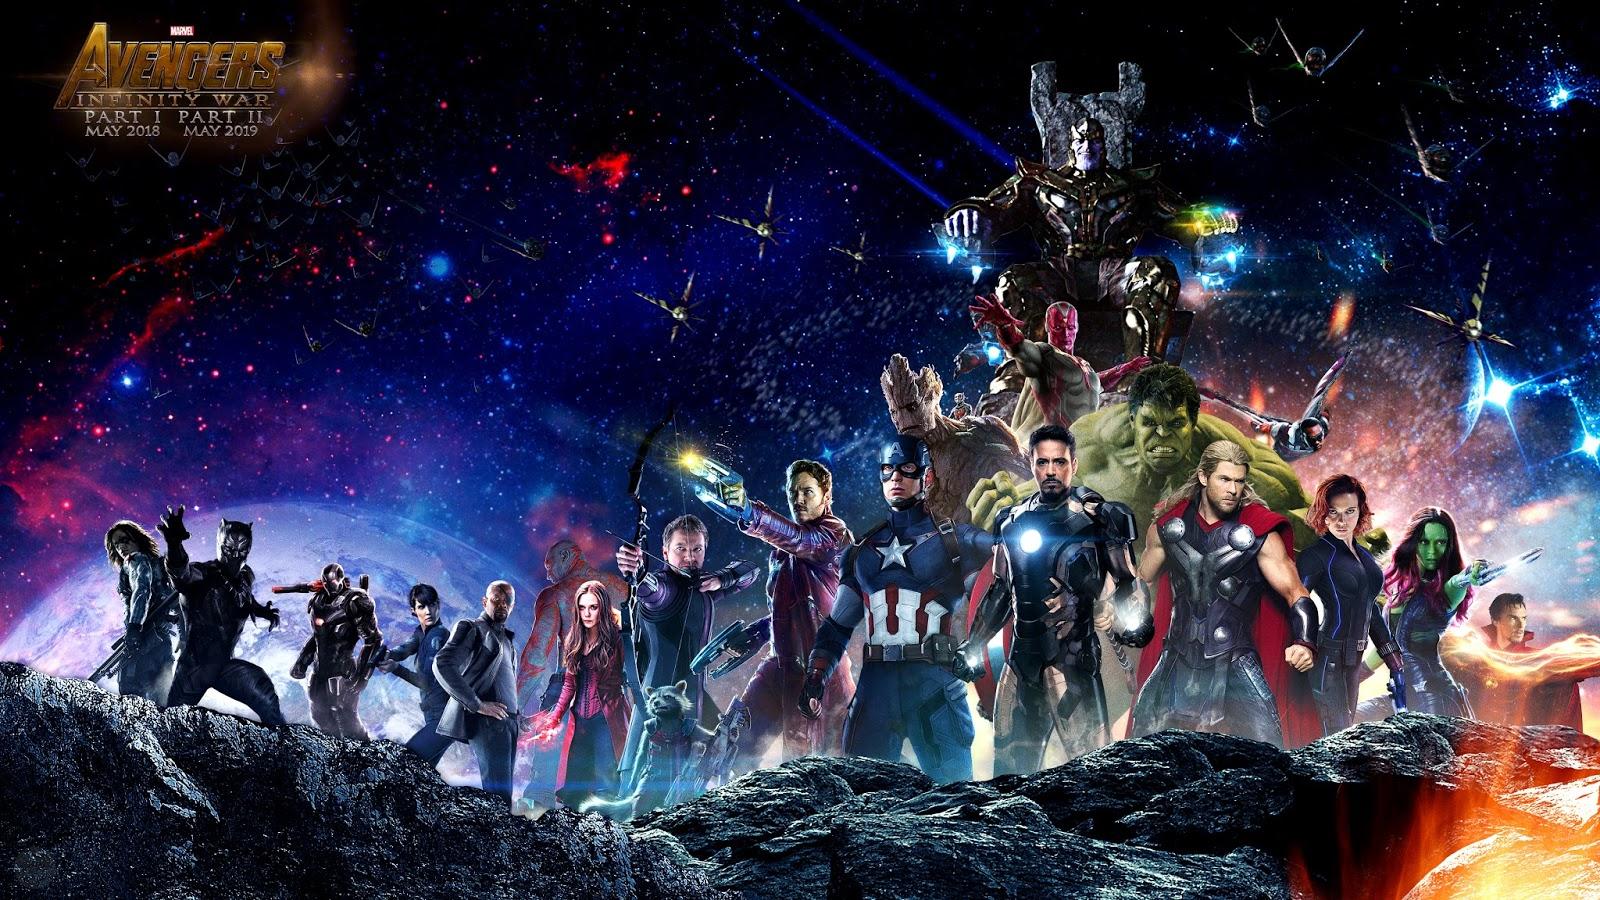 Avengers Infinity War Wallpapers - Avengers 2018